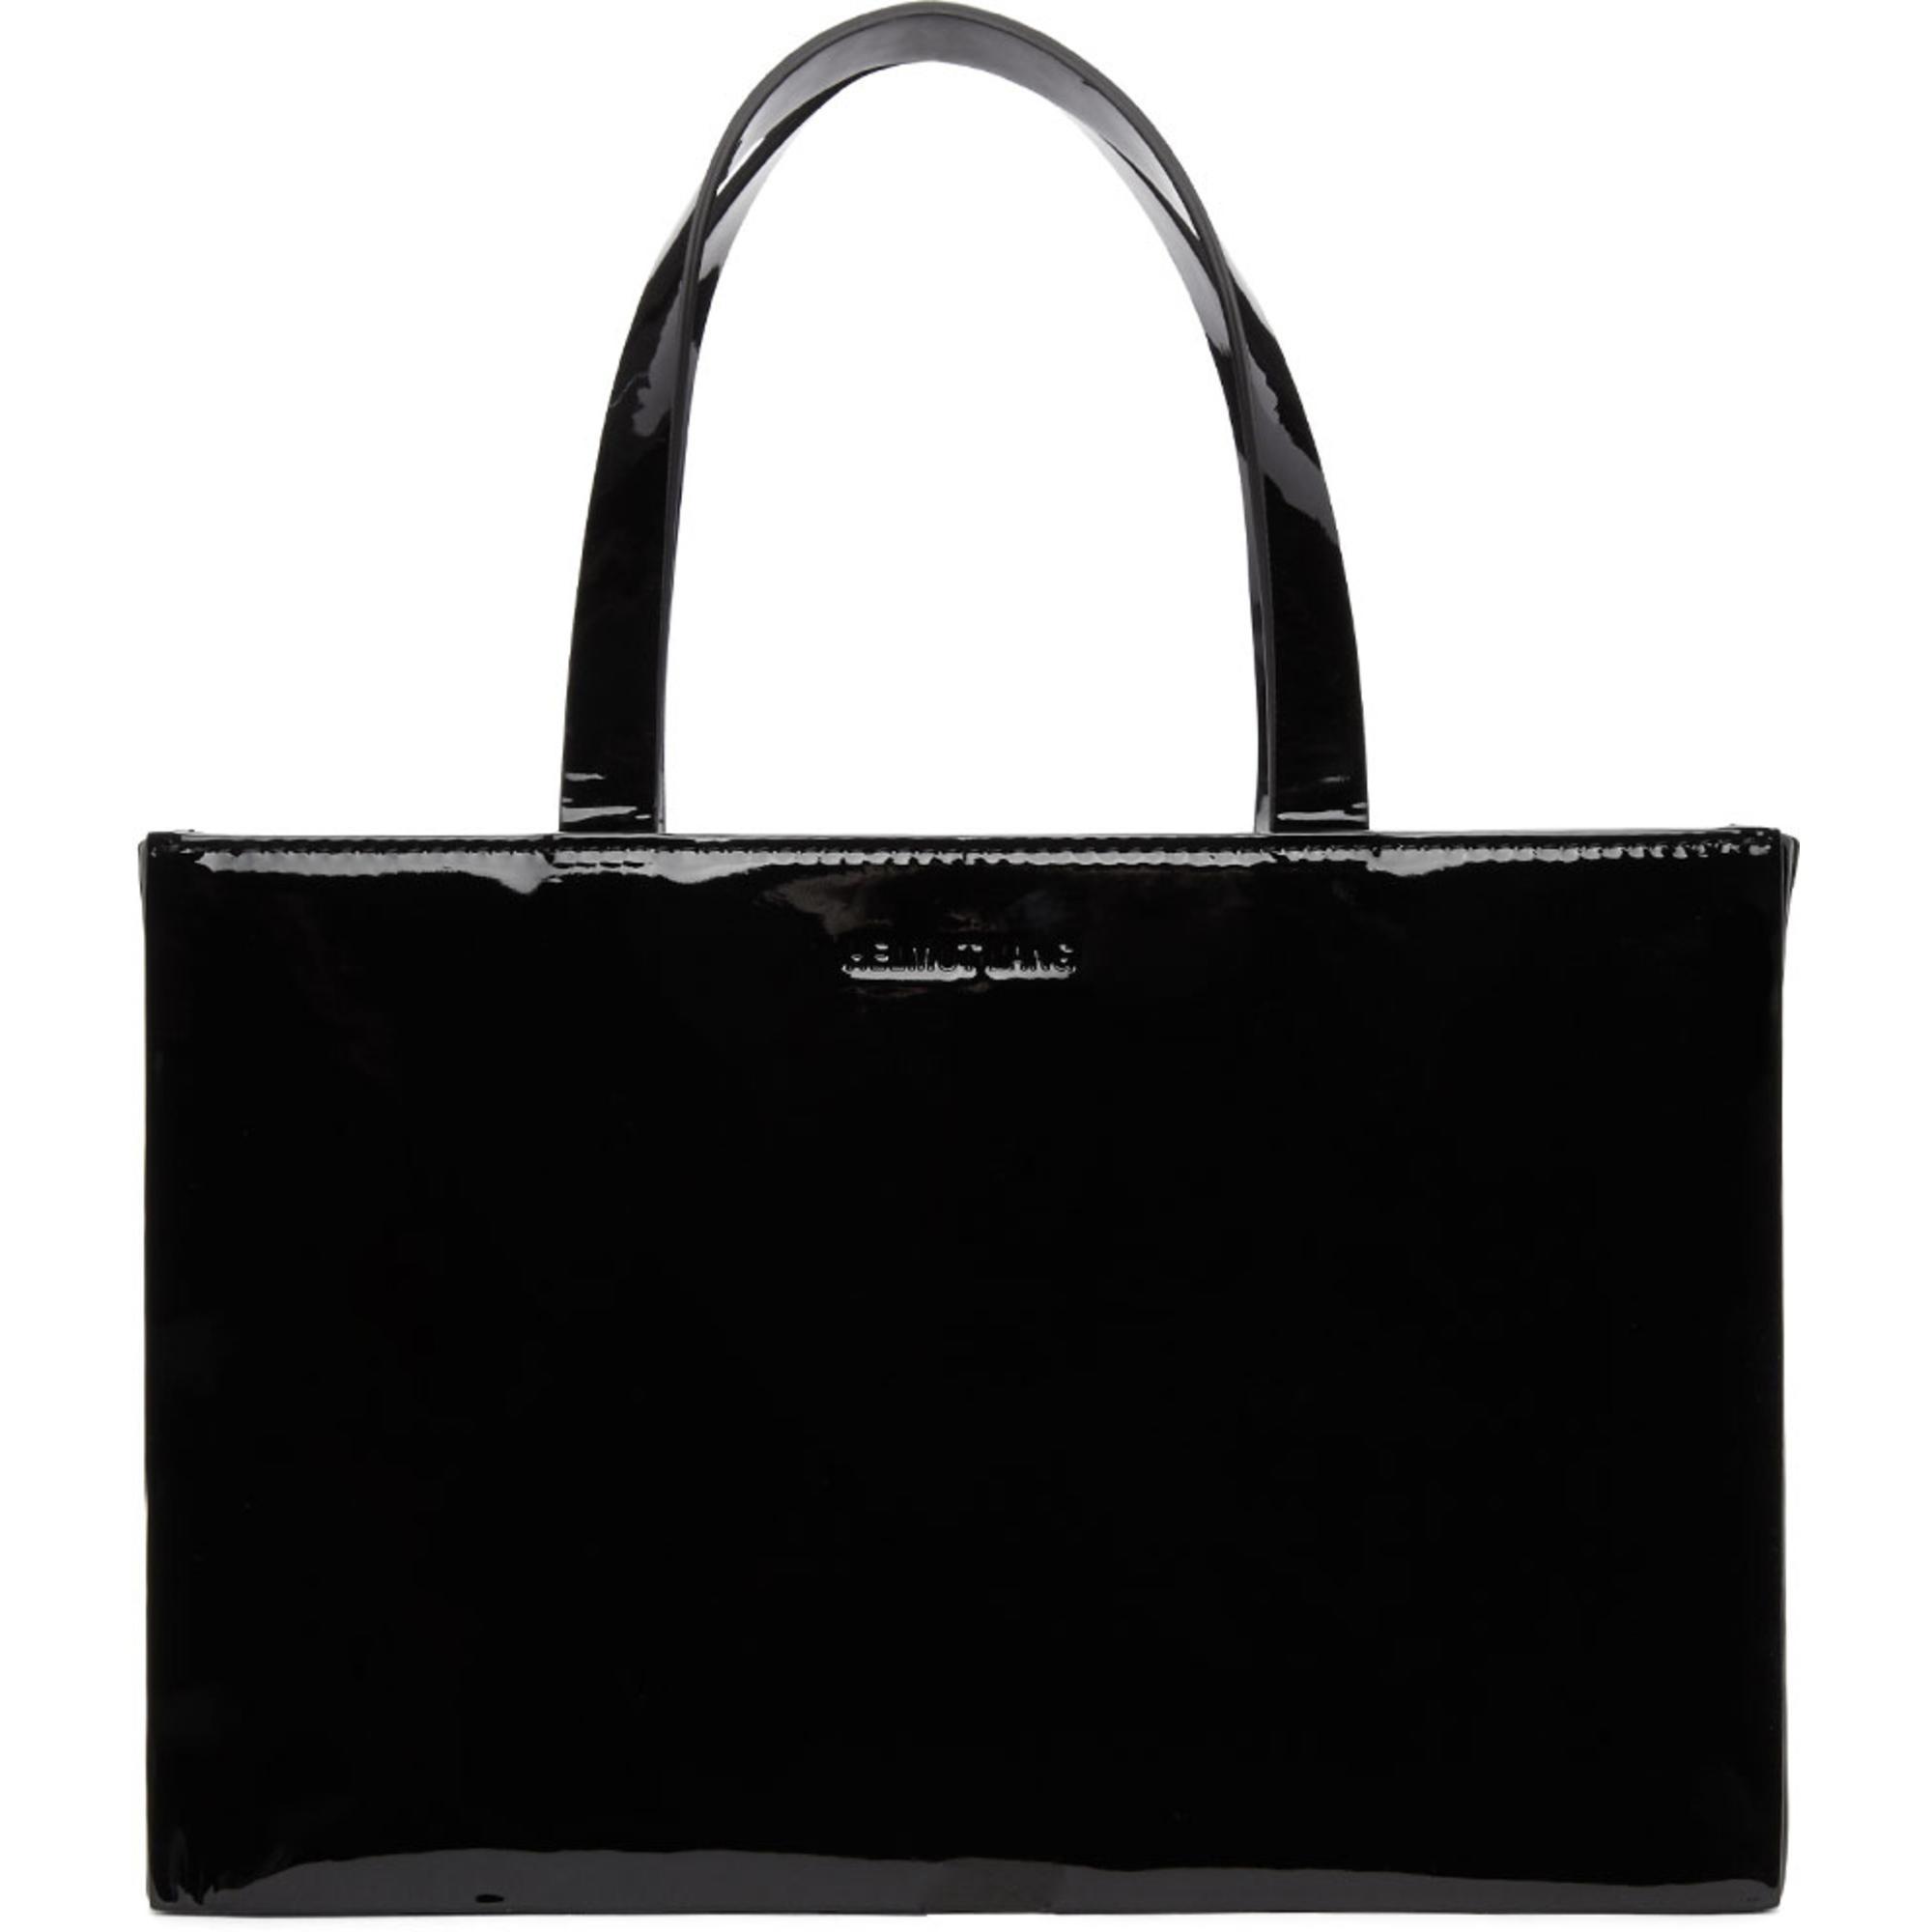 Mini Flap Bag in Black Patent Leather Helmut Lang 6g6TVMPC